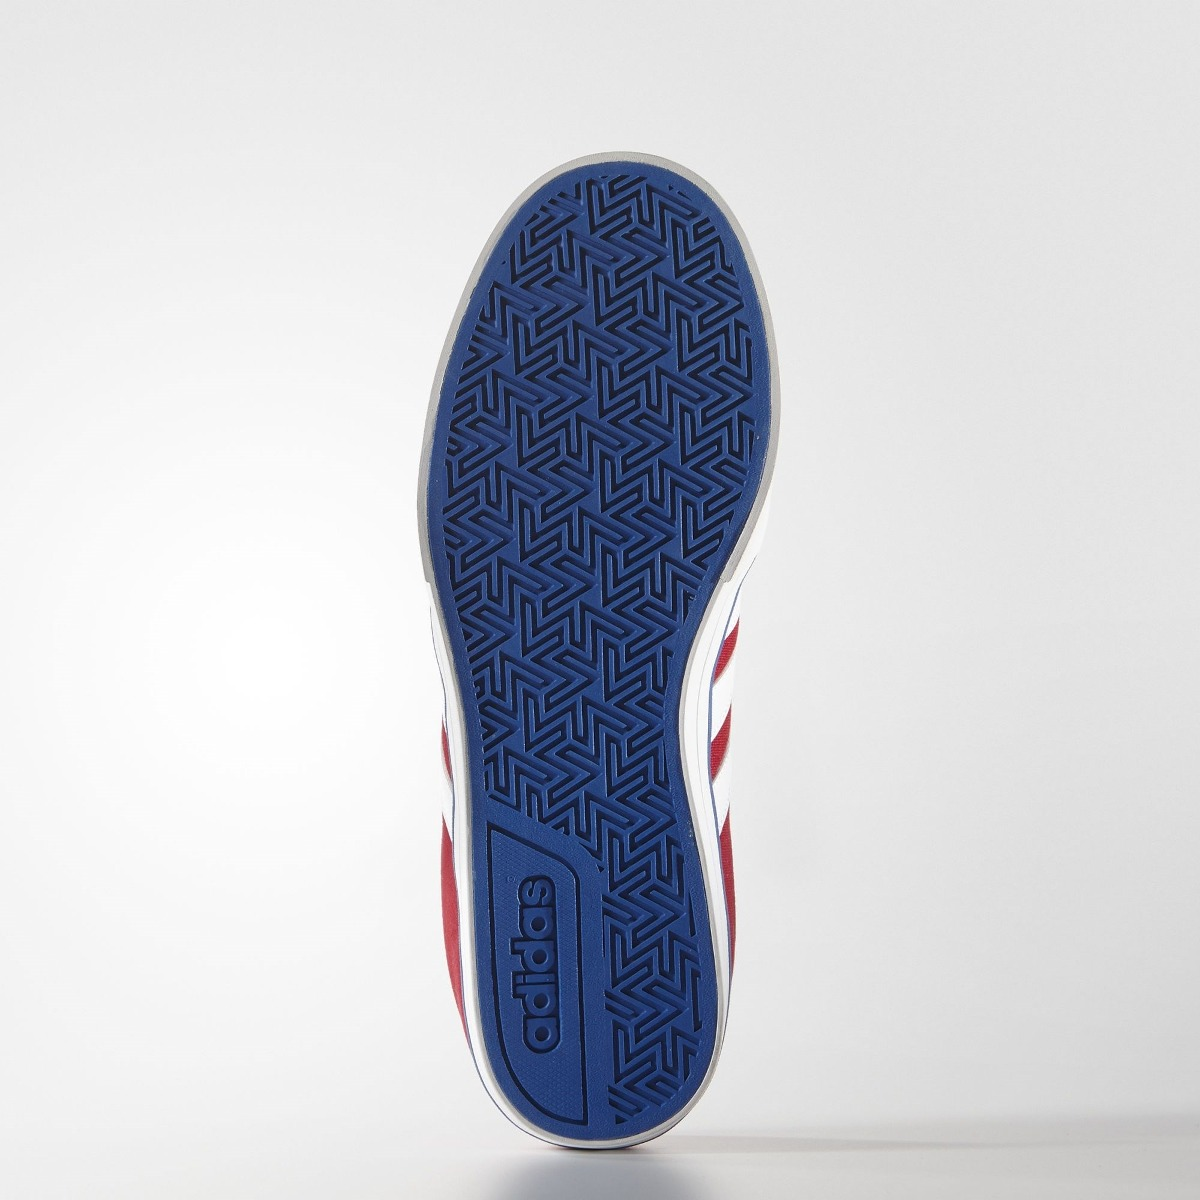 b260ad0f96398 ... low price tenis neo vs skate para caballero adidas aq1487. cargando zoom.  5795f 55bfa